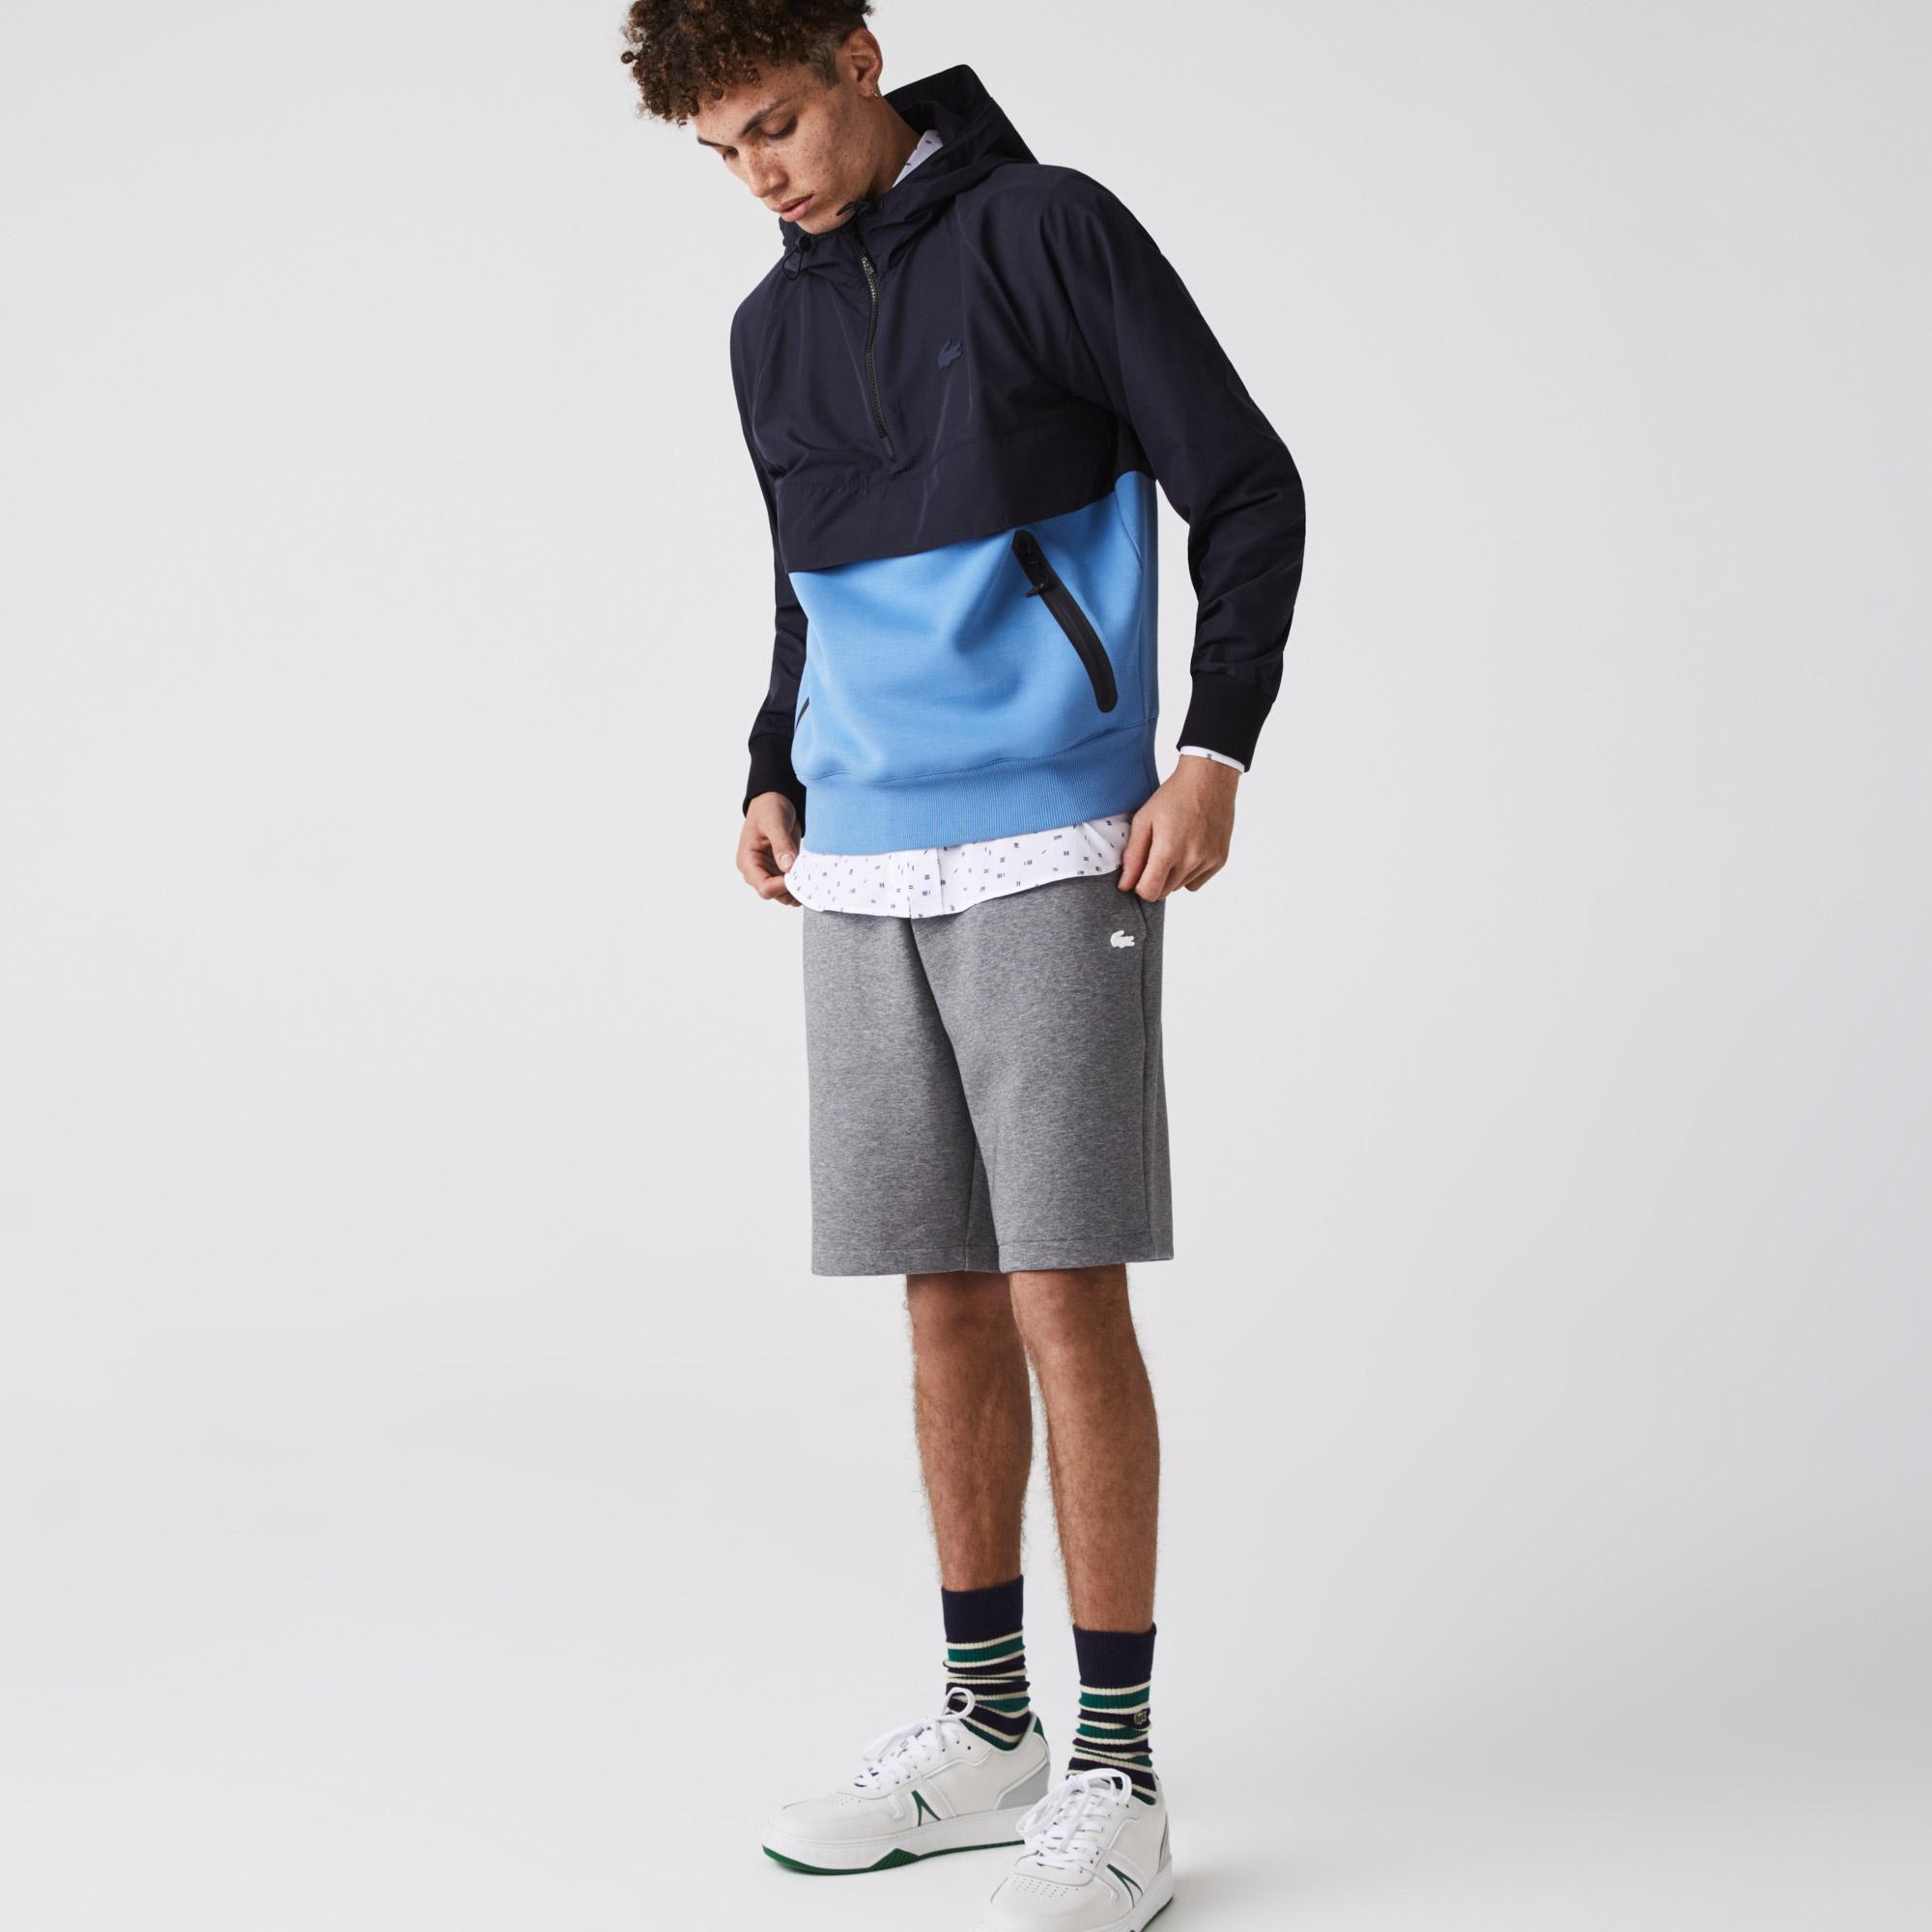 Lacoste Kurtka męska pullover z dwóch materiałów